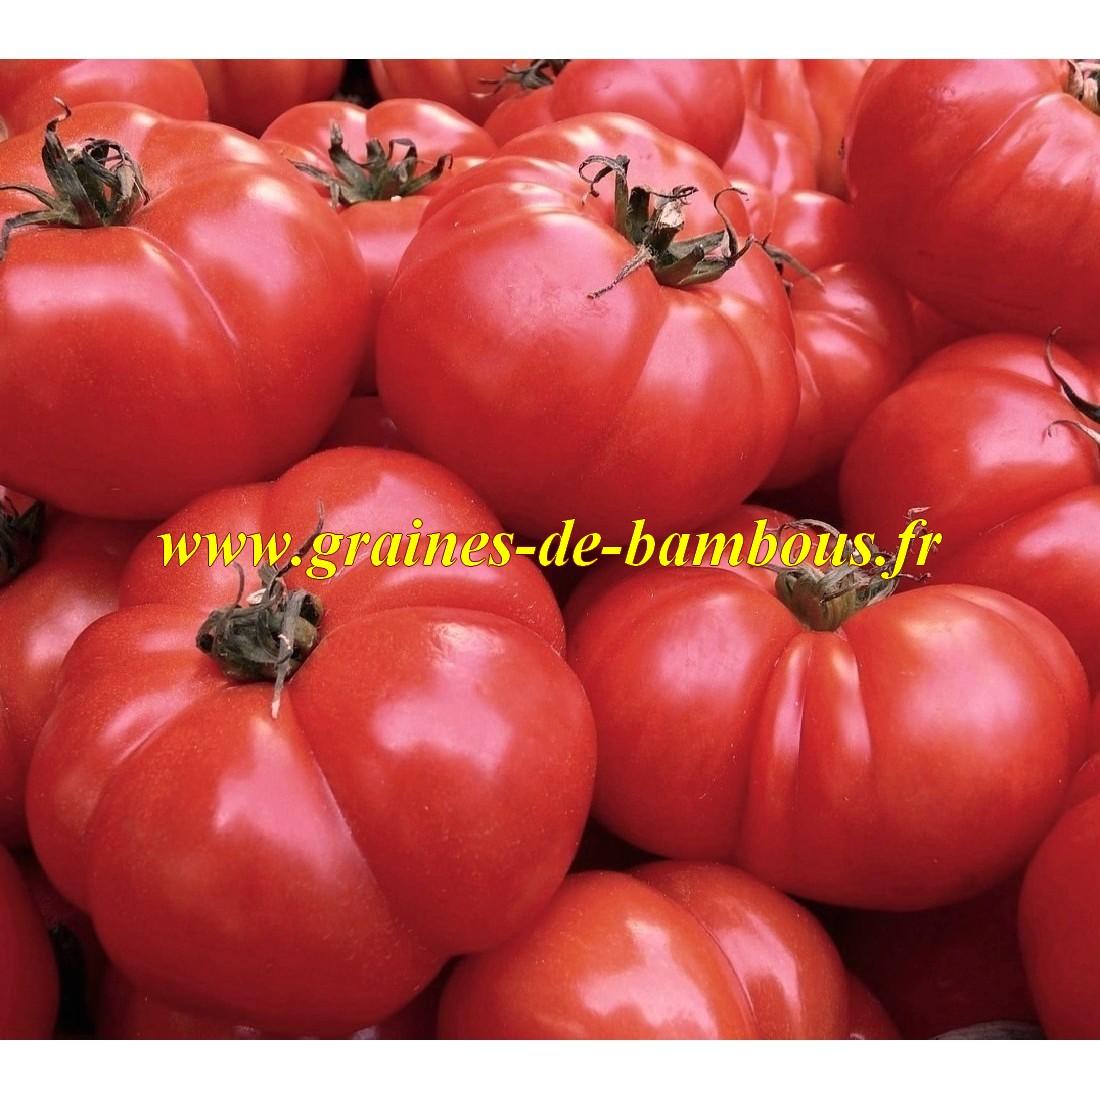 Graines de tomate belge geante